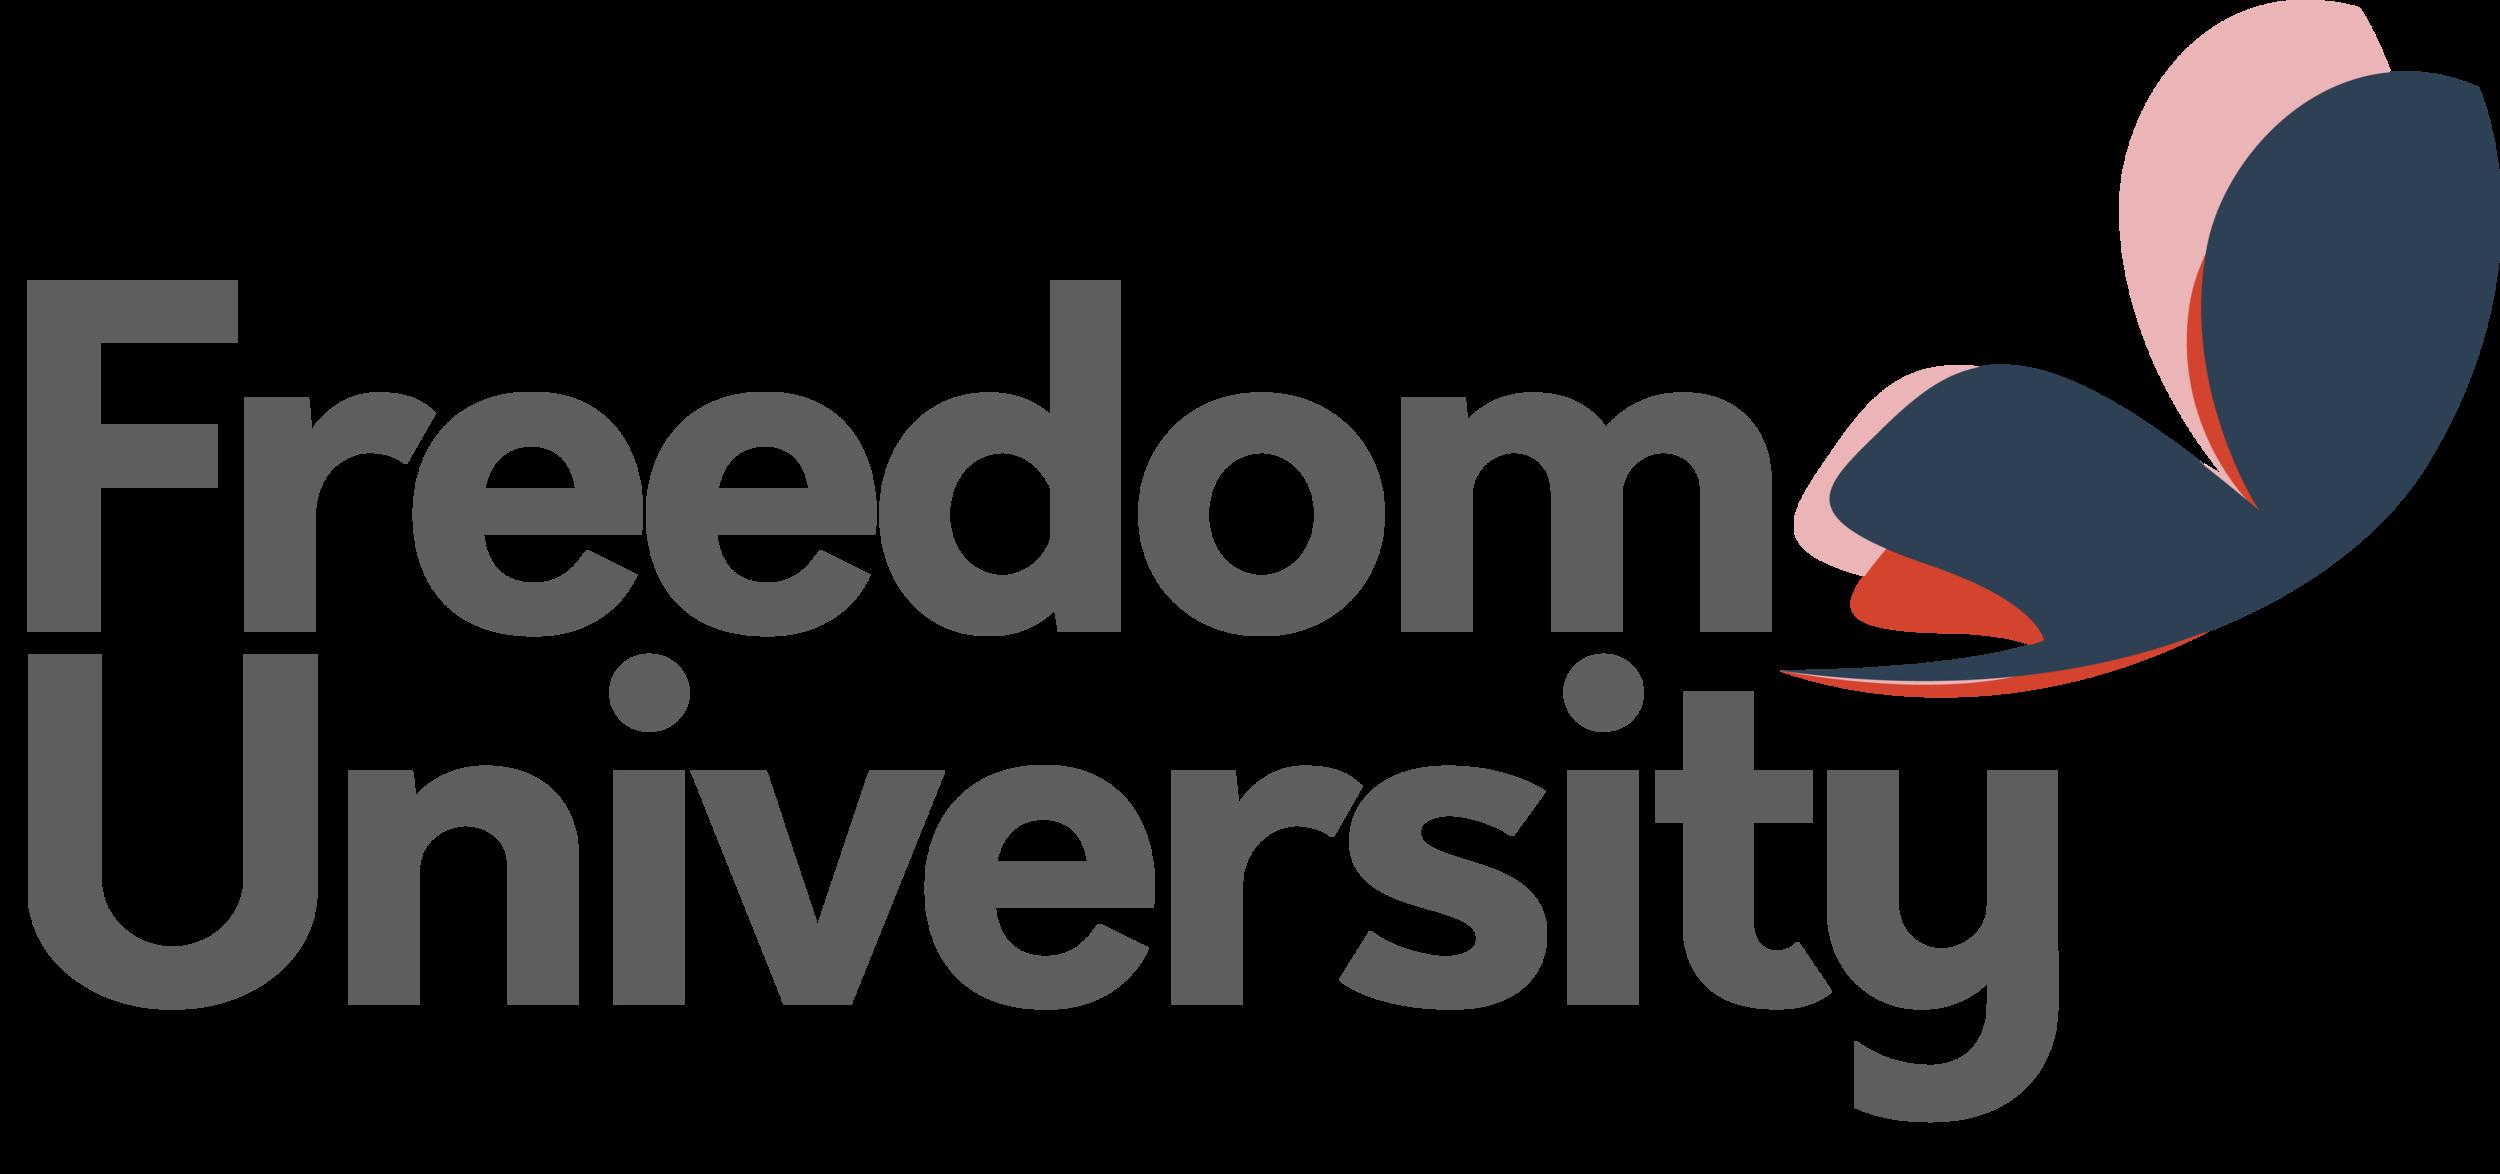 NEW FREEDOM U LOGO 2018.png